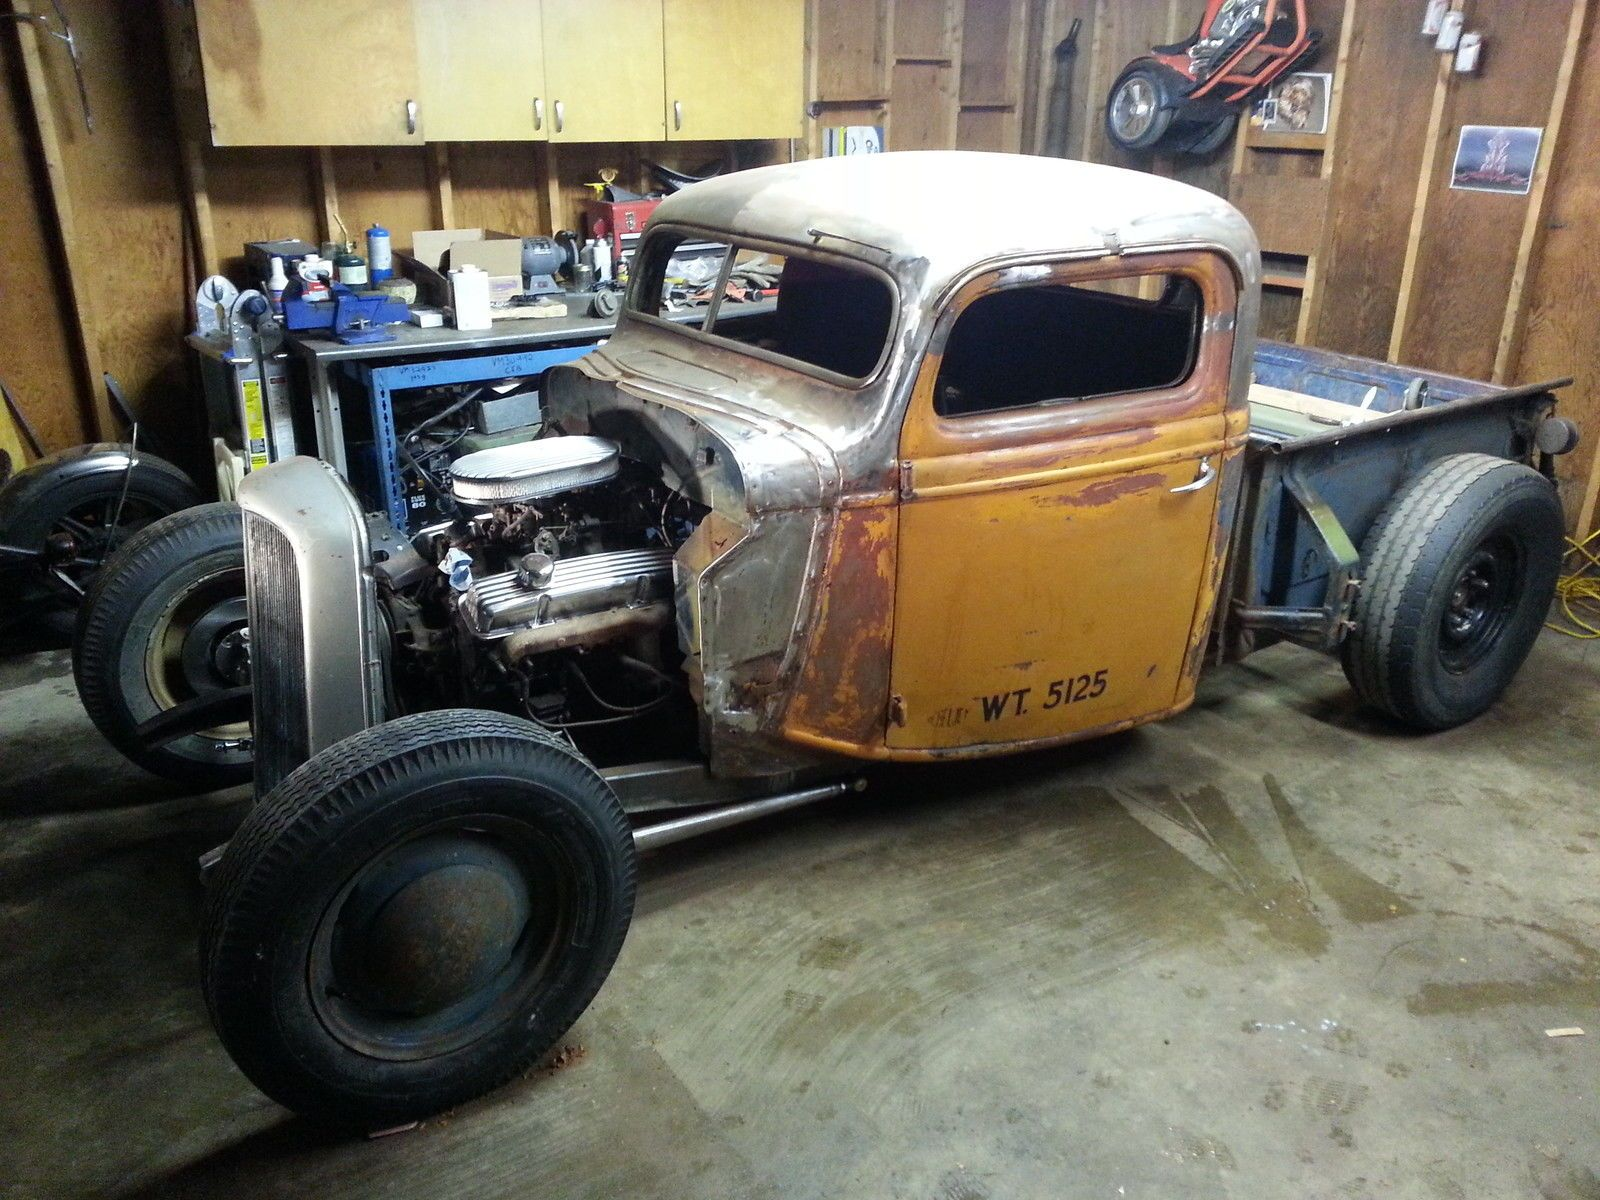 39 Ford Bobber Pickup Rat Rod Bobber Antique Cars